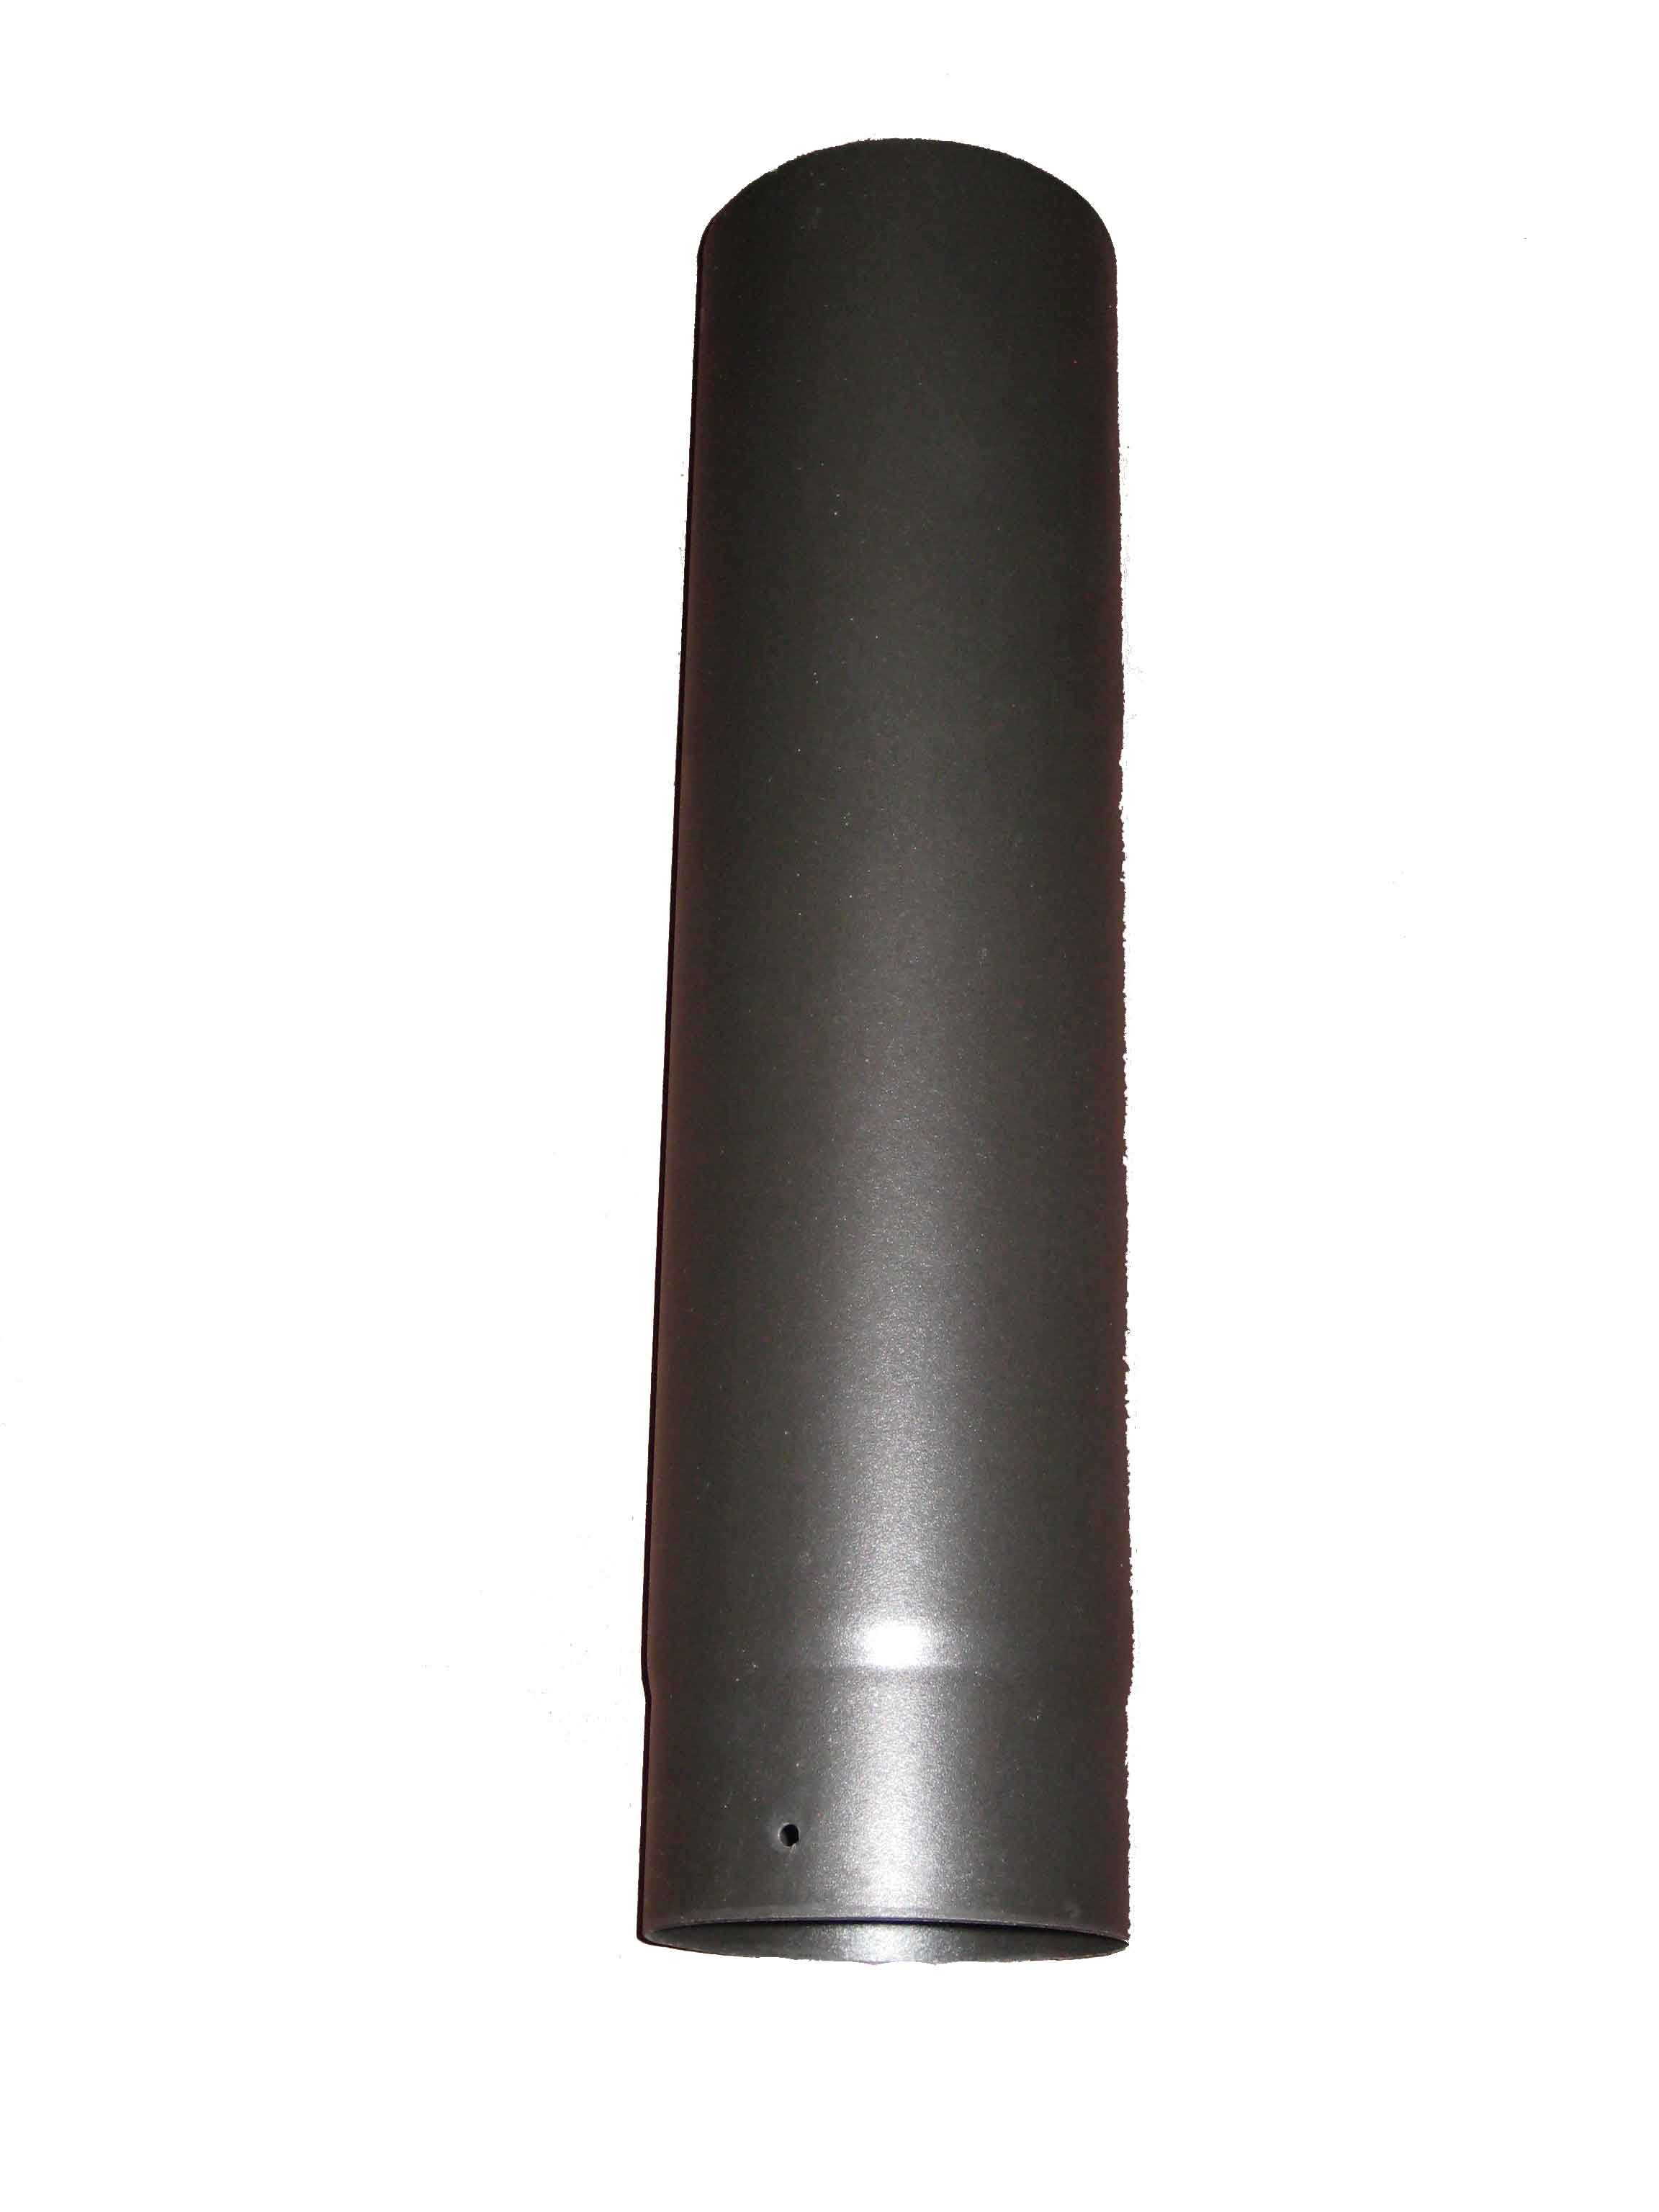 "Matt Black Enamel 500mm Straight MBE Pipe 5"""